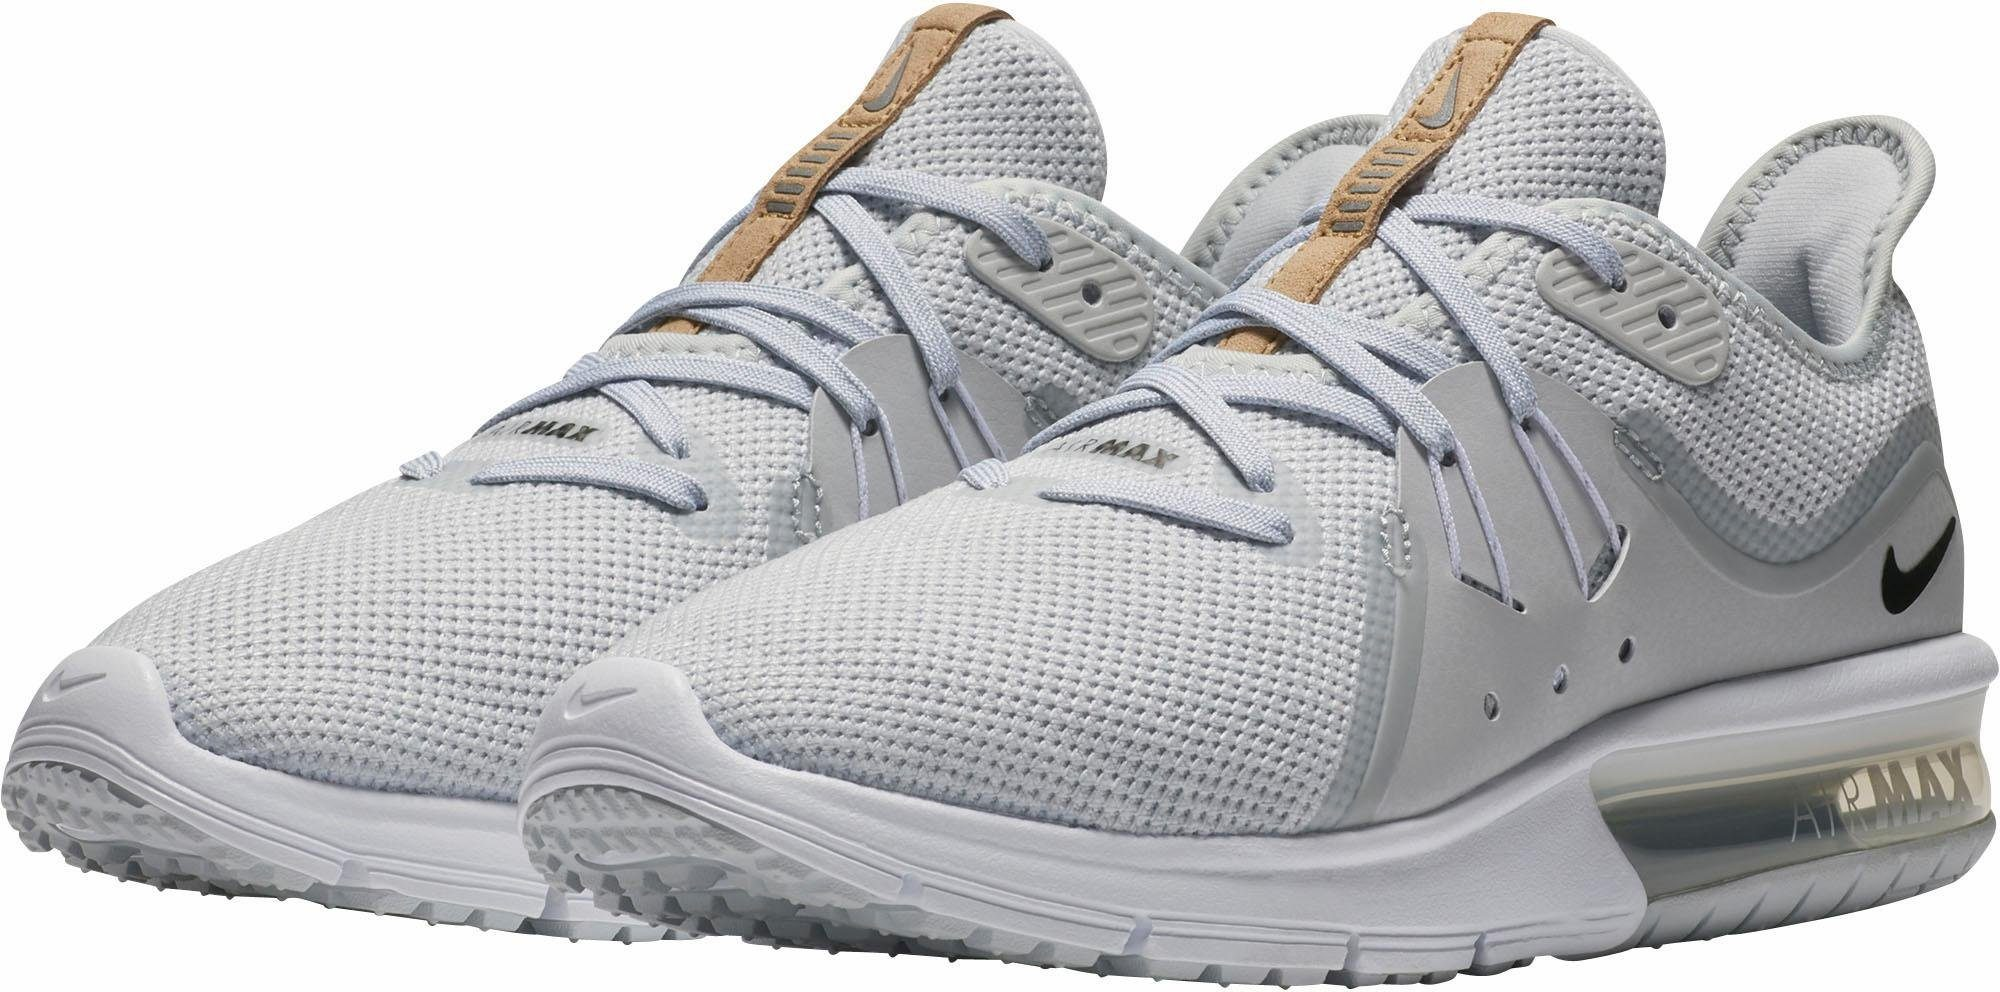 Nike WMNS Nike Air Max Sequent 3, Sneaker Damen